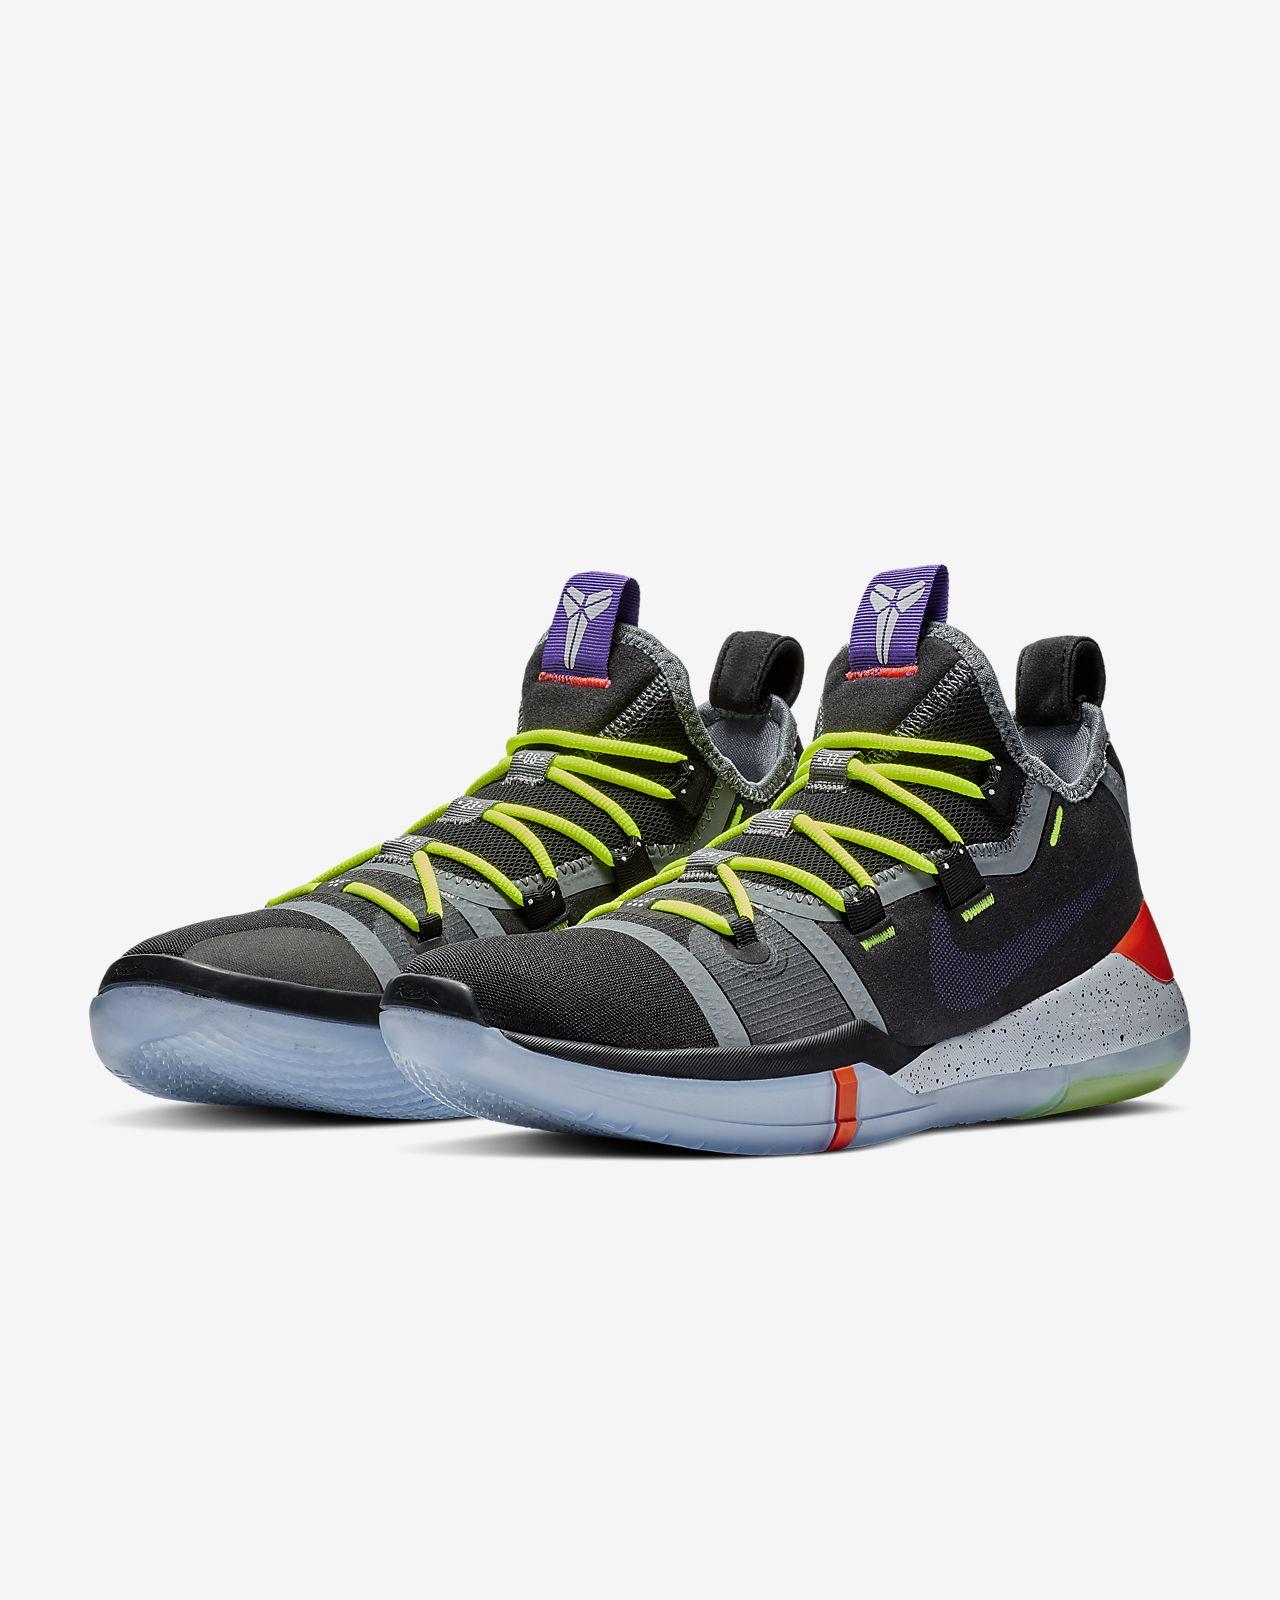 new concept f6cc5 b374e Low Resolution Kobe AD Basketball Shoe Kobe AD Basketball Shoe